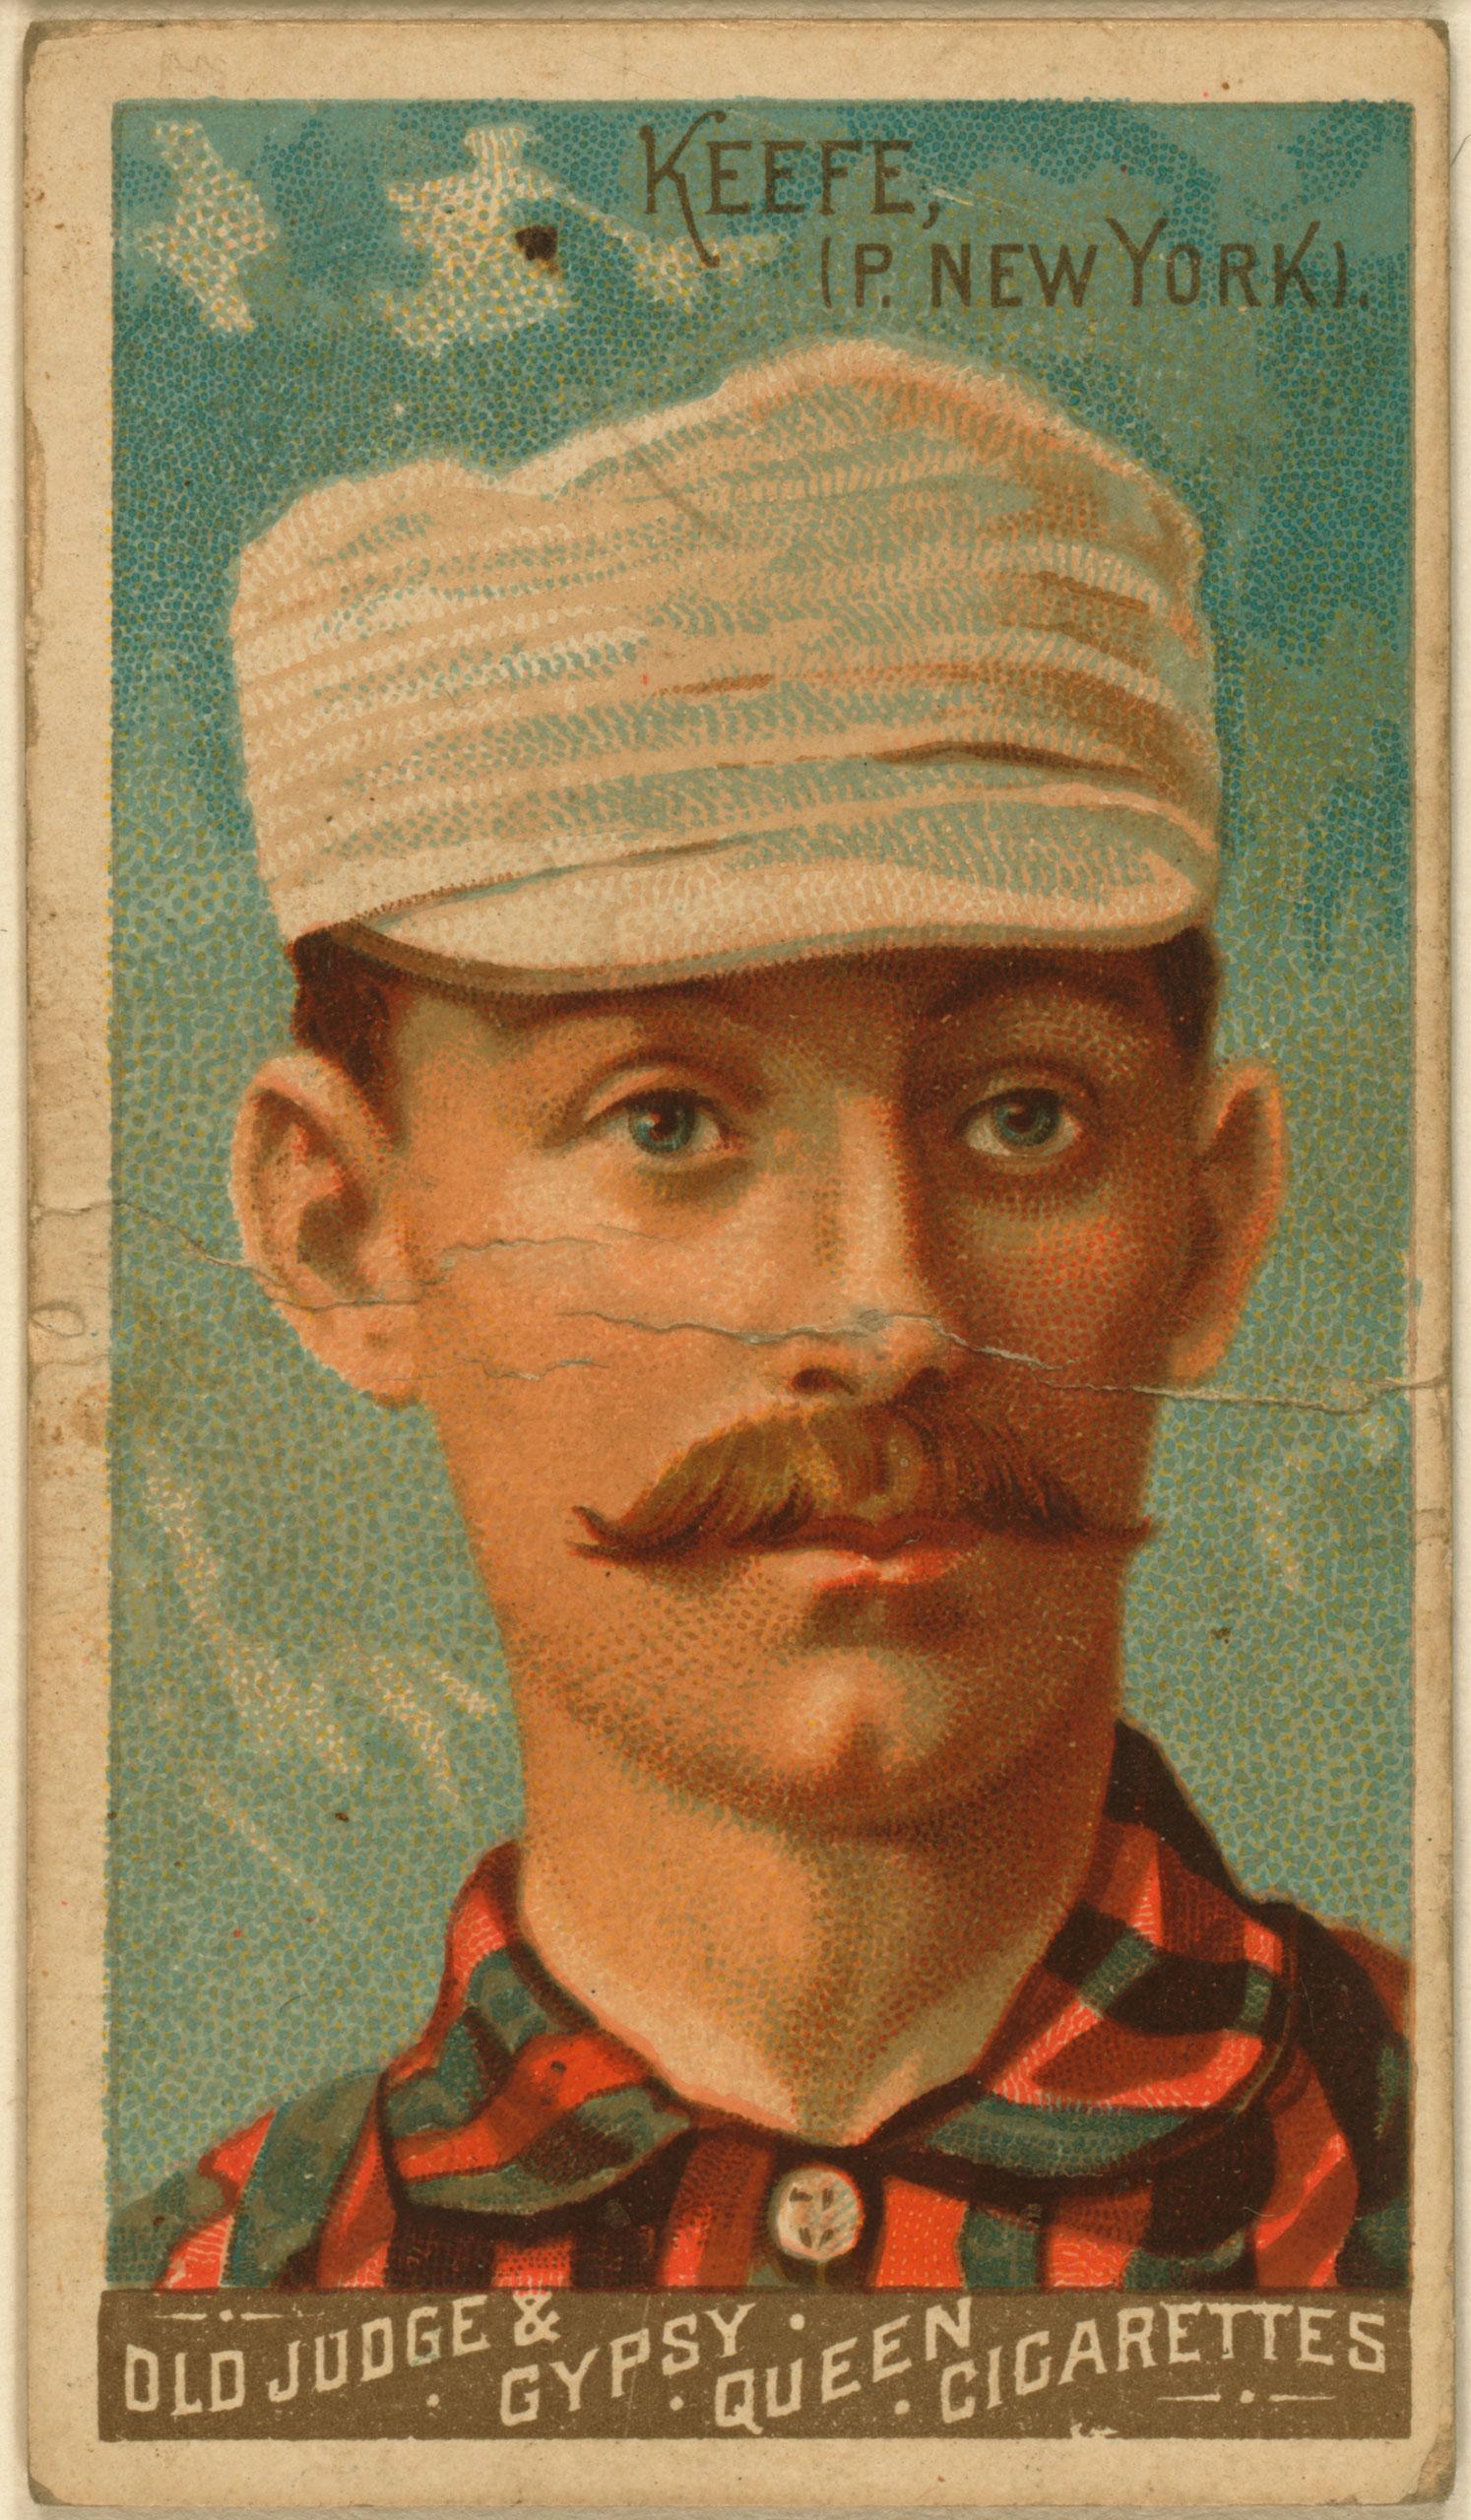 Tim Keefe, New York Giants, baseball card, 1888.